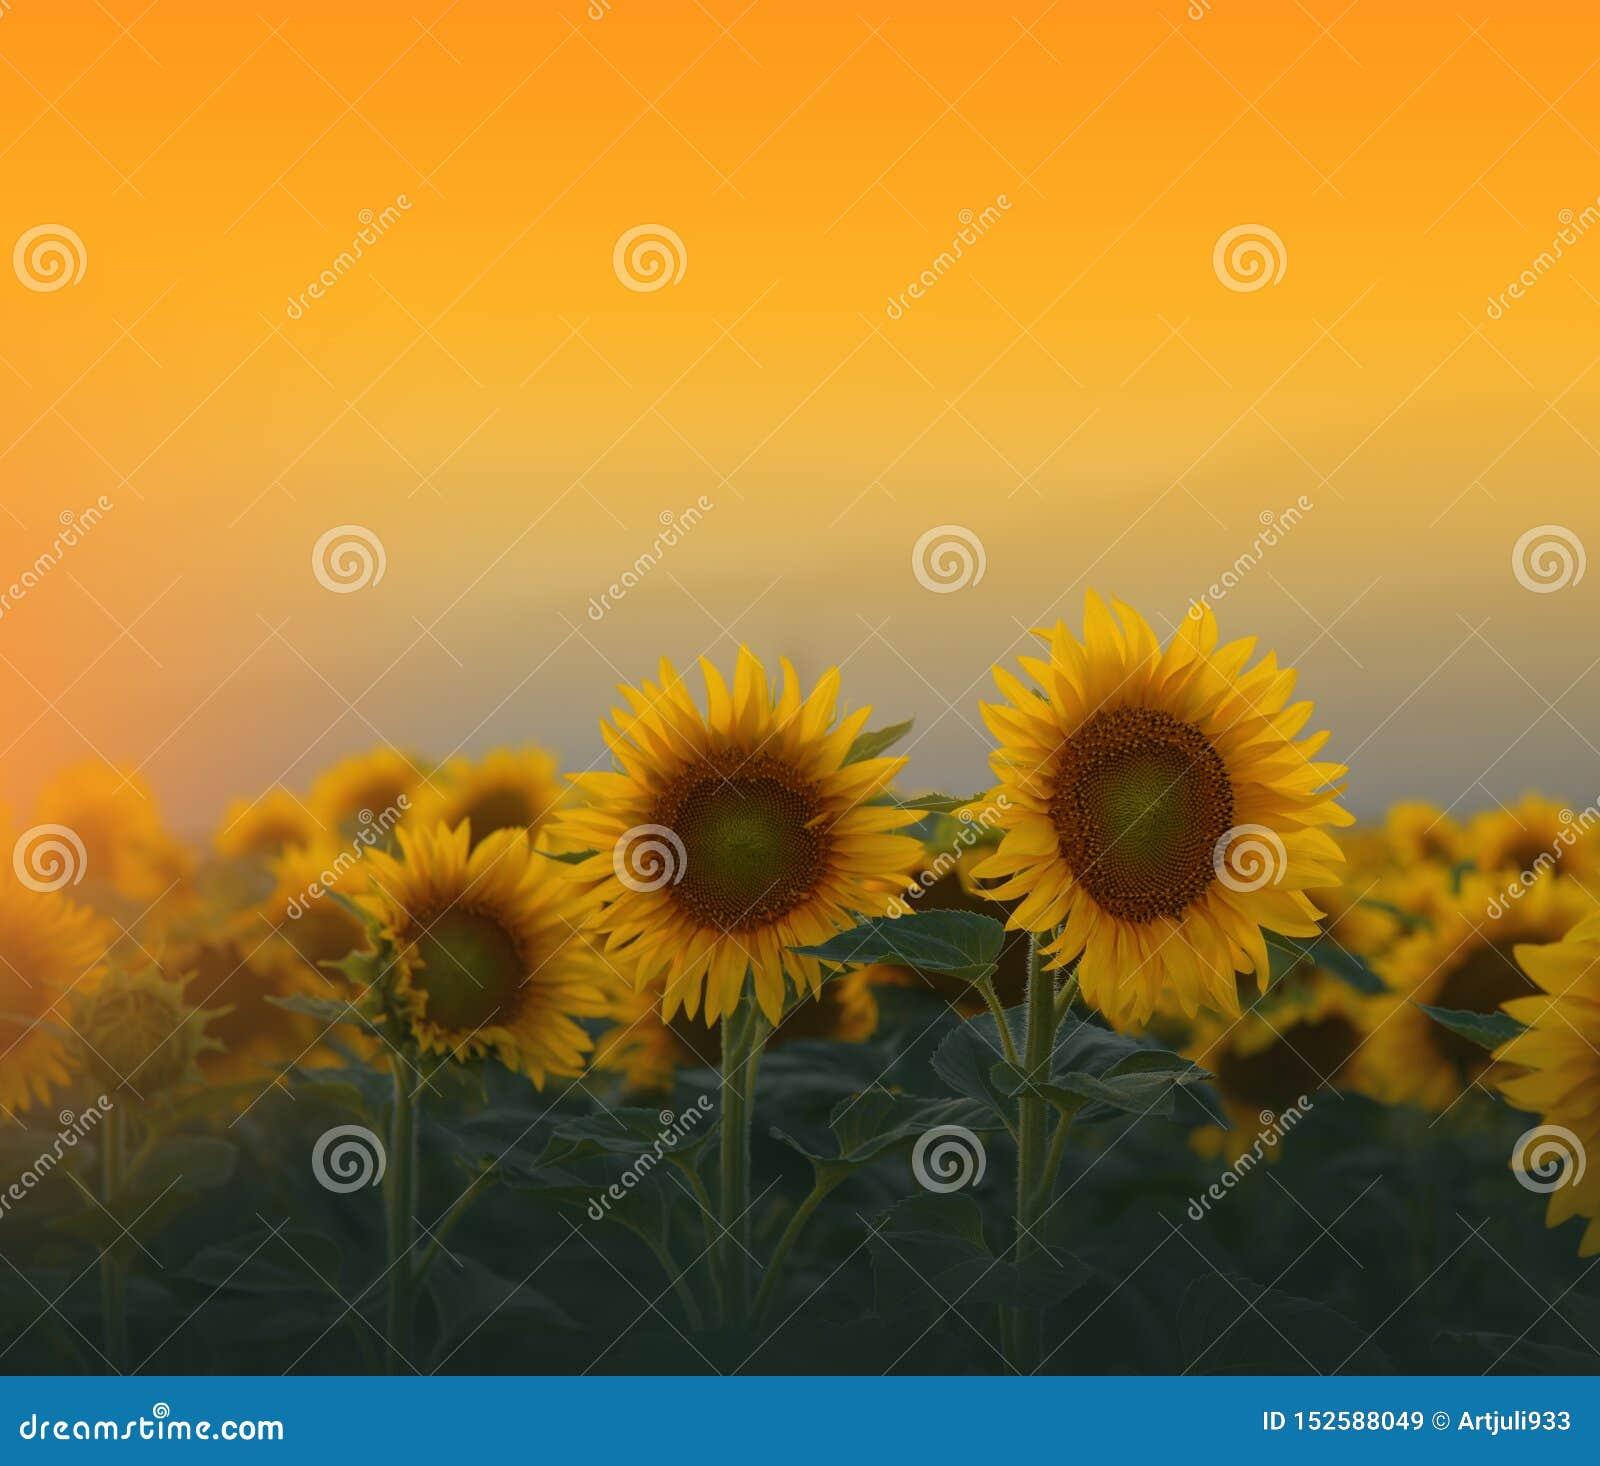 Sunflower Field At Sunsetbeautiful Orange Nature Background